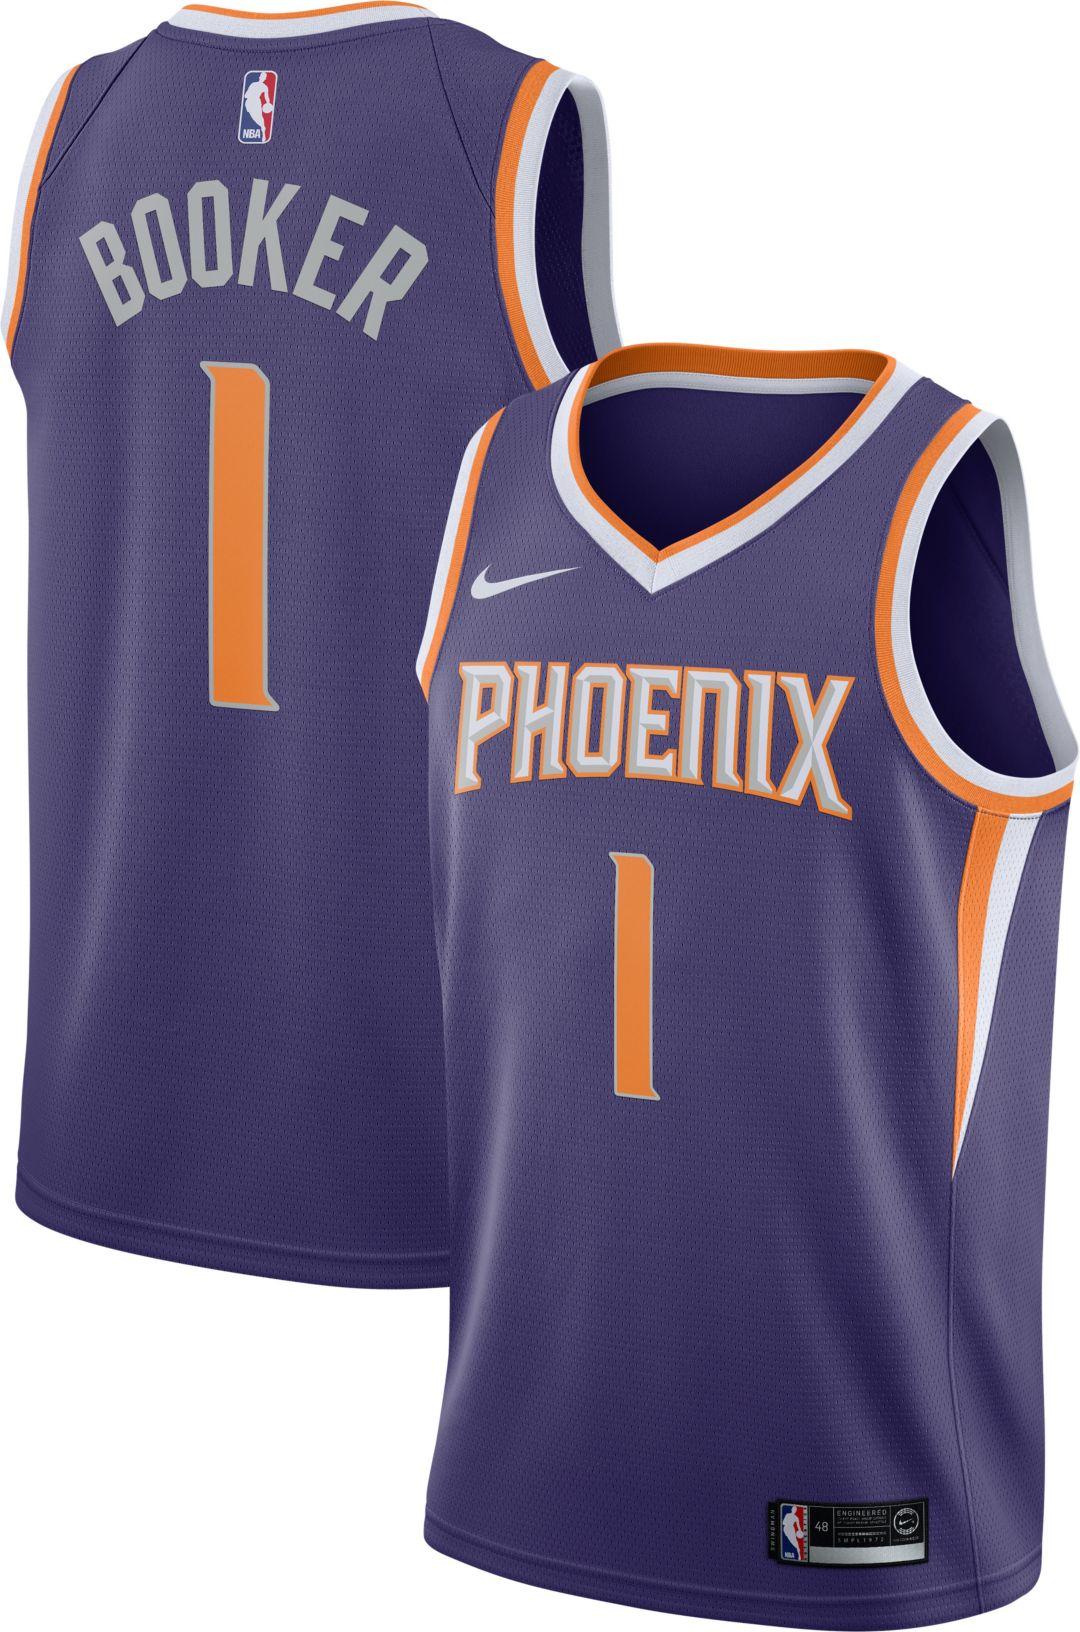 new arrival ccaf7 cf6f6 Nike Men's Phoenix Suns Devin Booker #1 Purple Dri-FIT Swingman Jersey